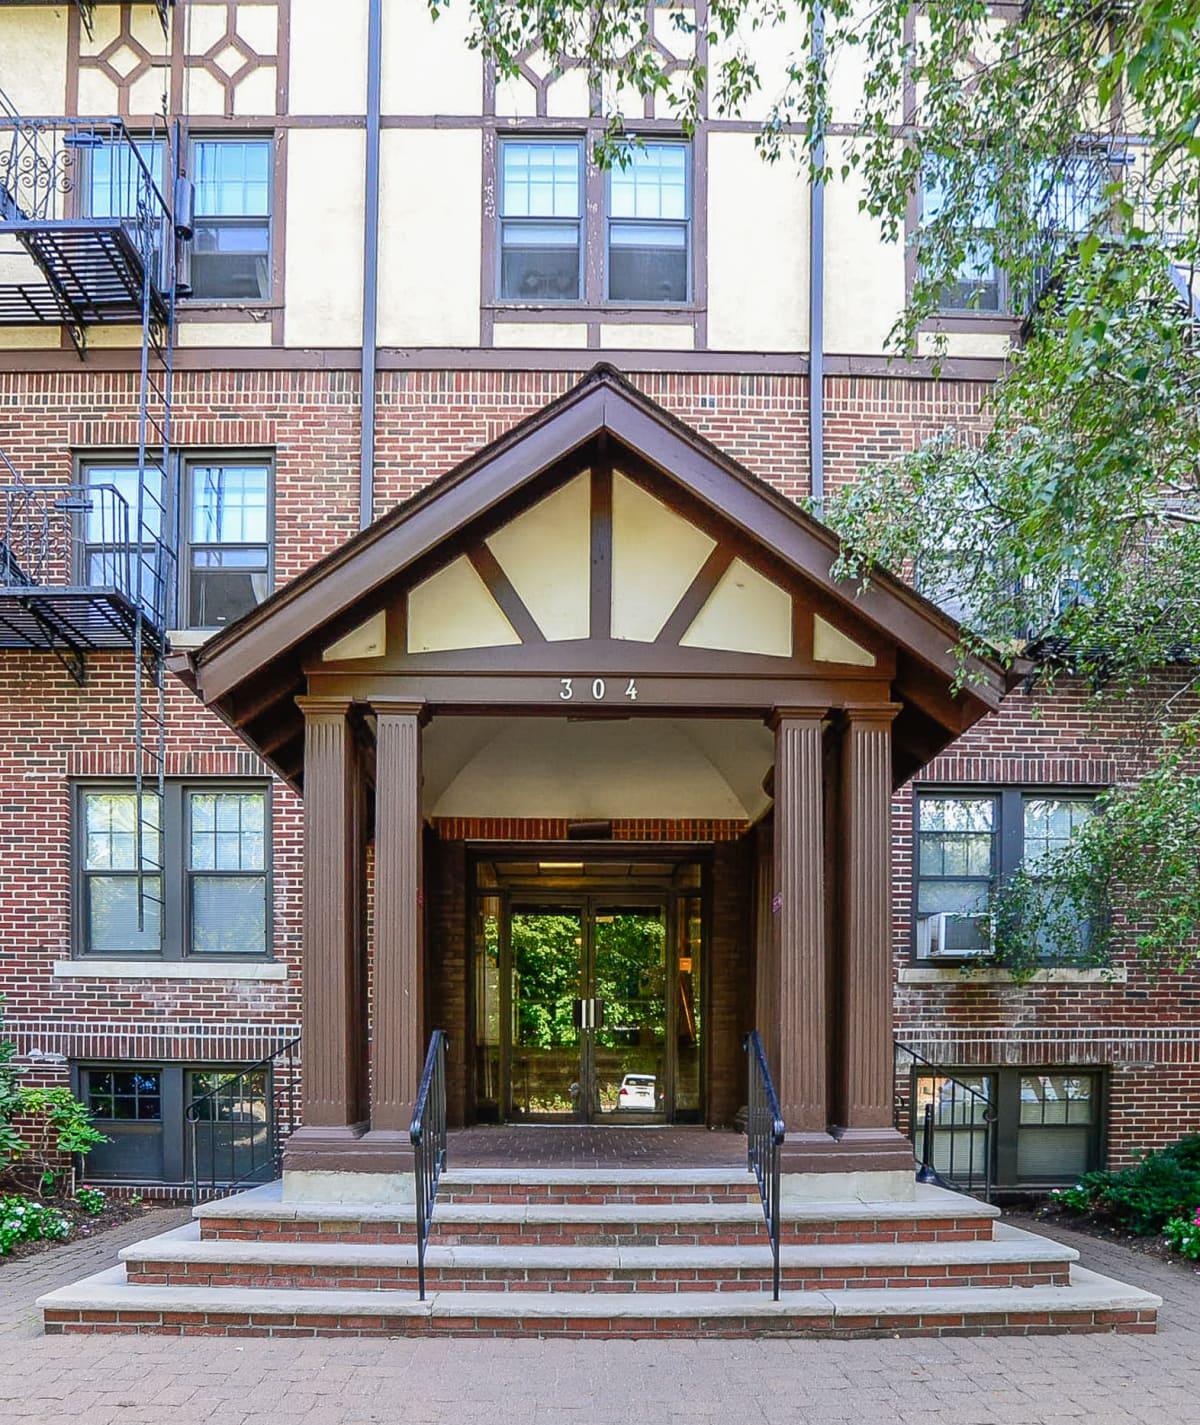 Apartments in Nutley, NJ